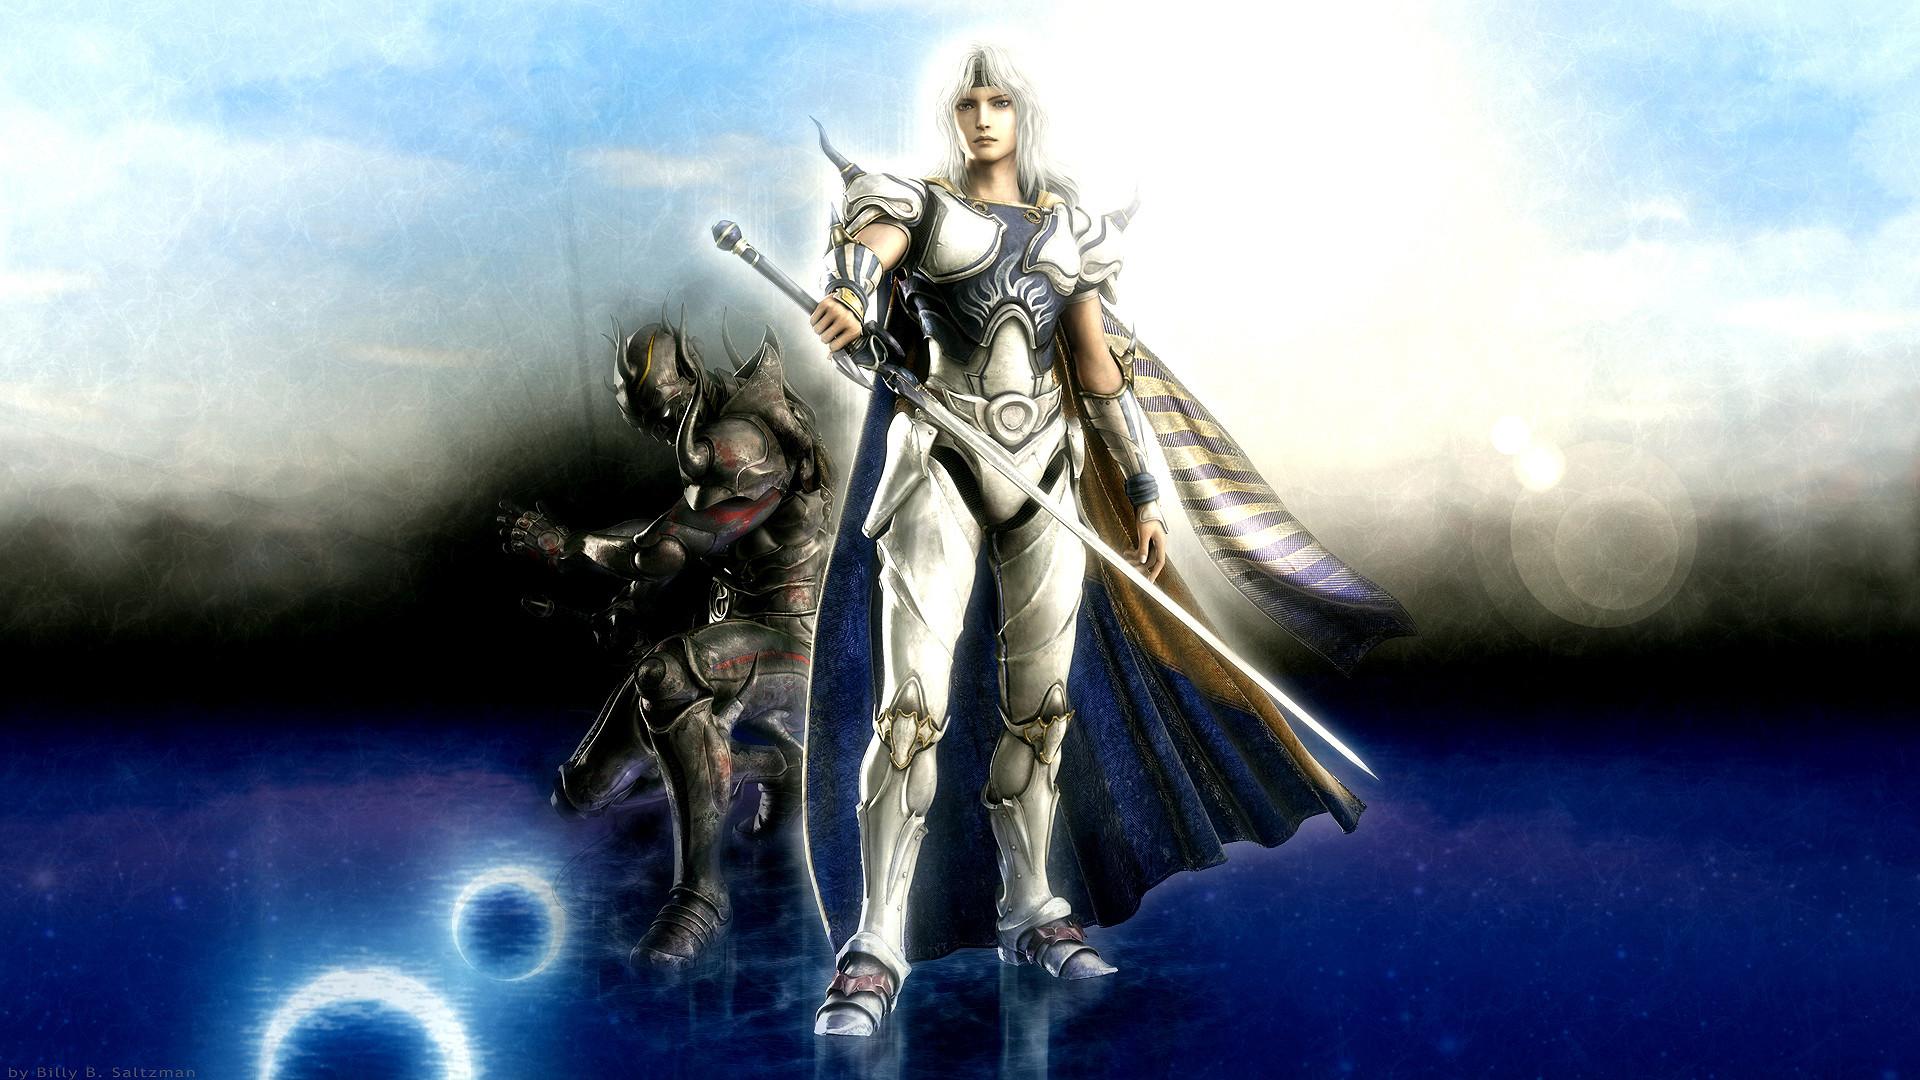 … Final Fantasy IV Wallpaper 3 by Billysan291